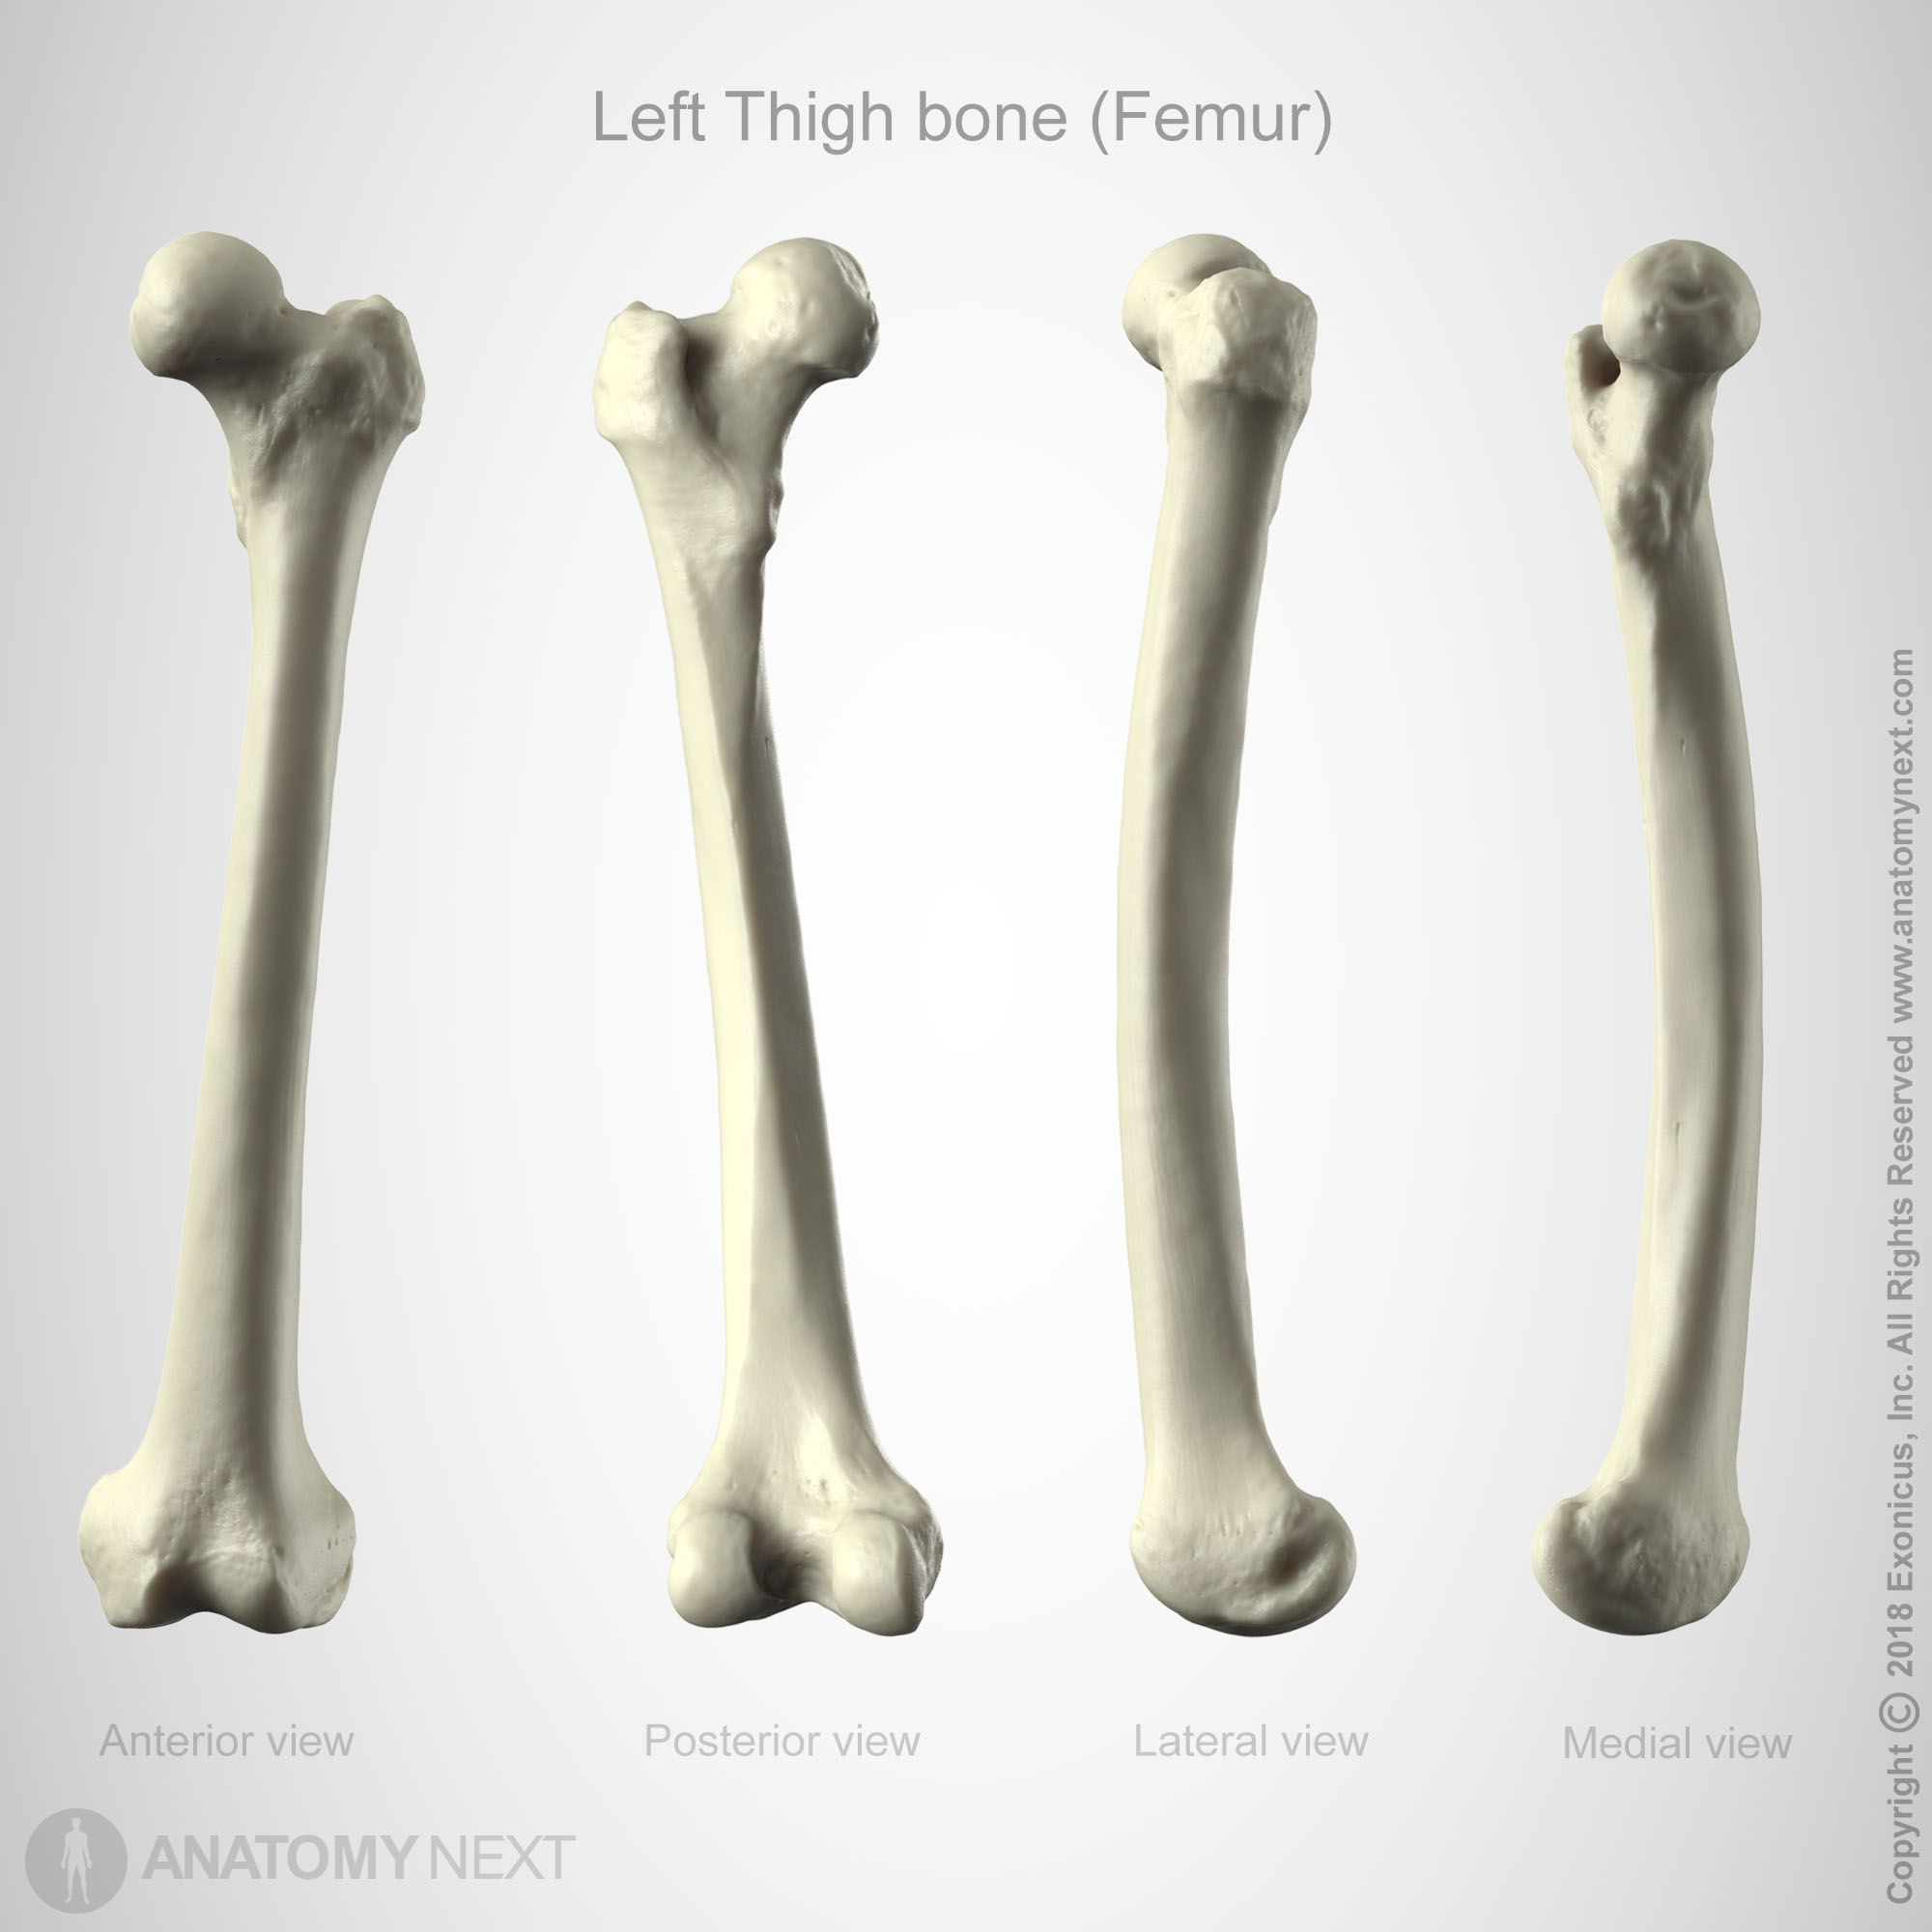 anatomy #3Danatomy #art #anatomynext #femur #bone | Anatomy Next ...